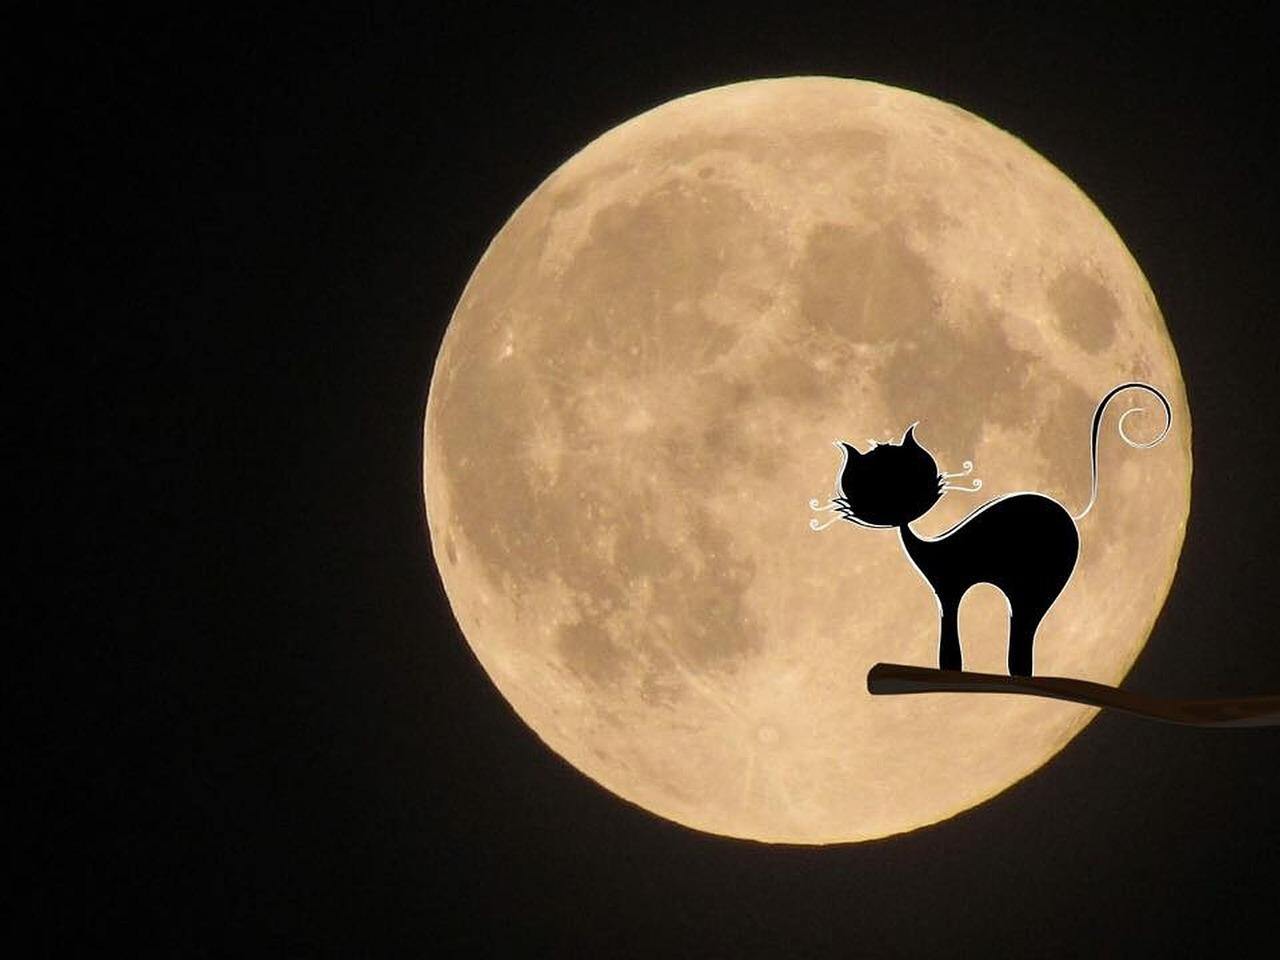 началось кошки под луной картинки влюбился